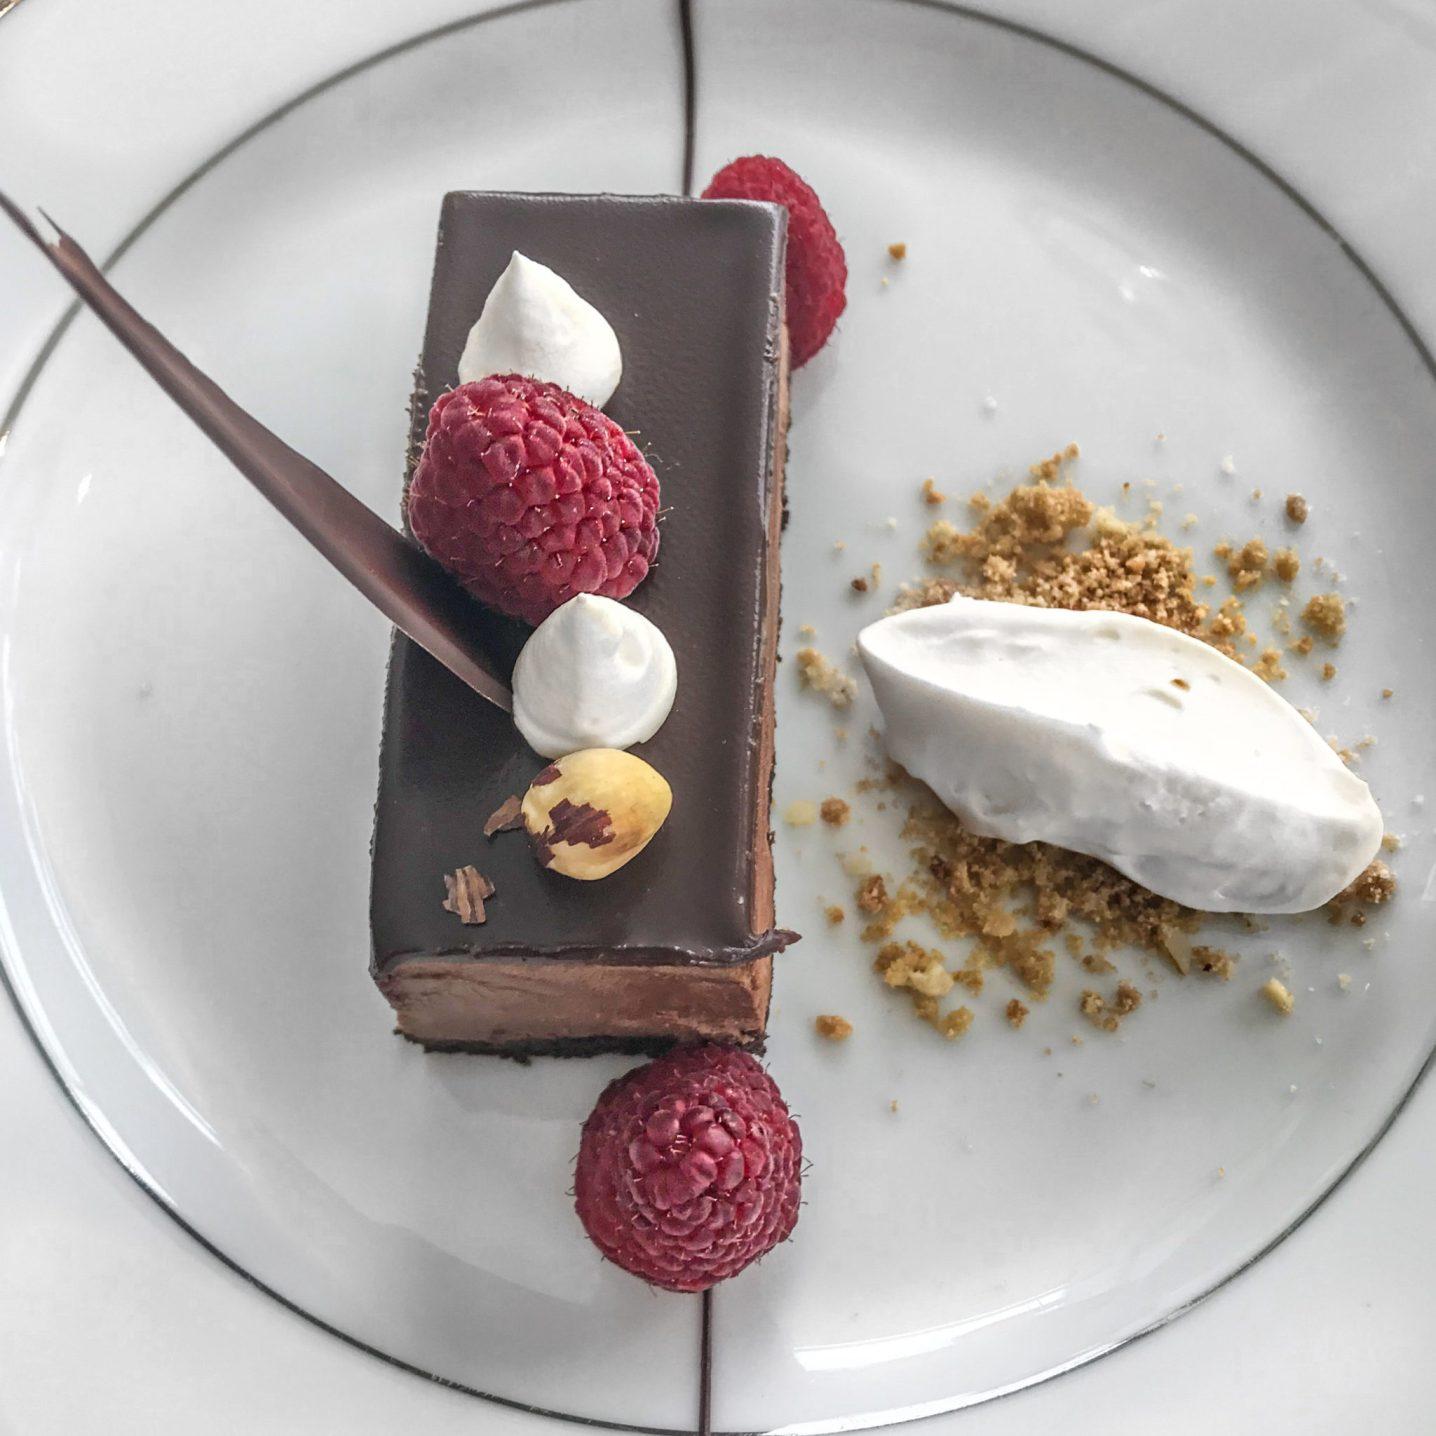 hotel x - luncheon - media preview - dessert